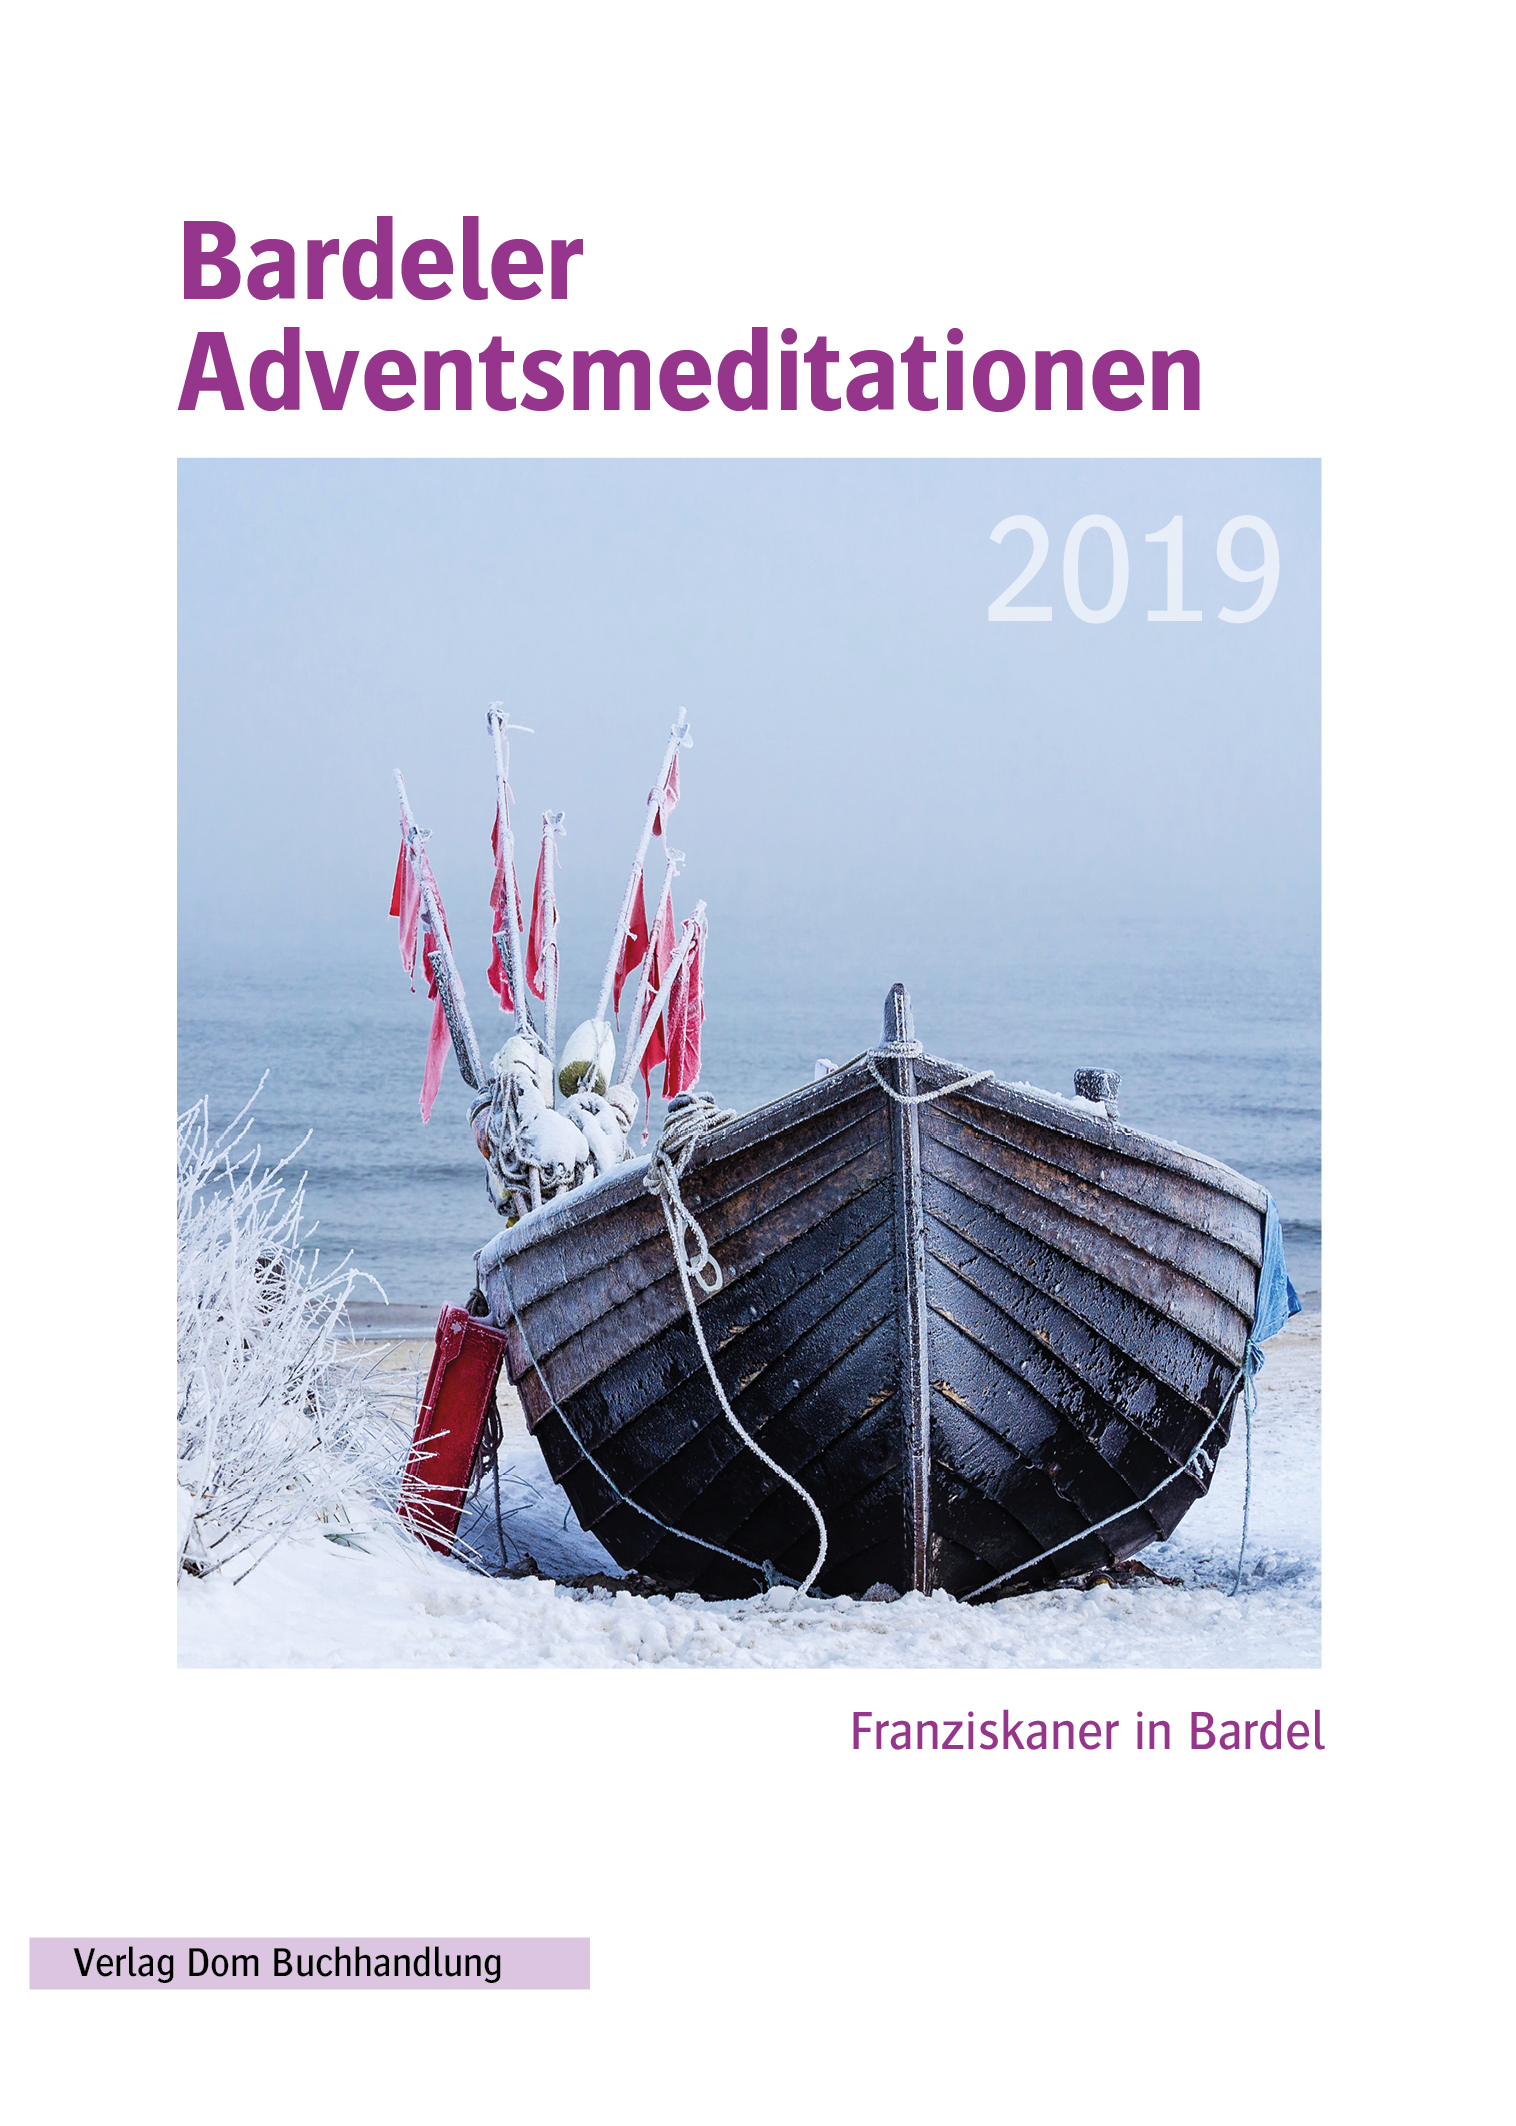 Bardeler Adventsmeditationen 2019